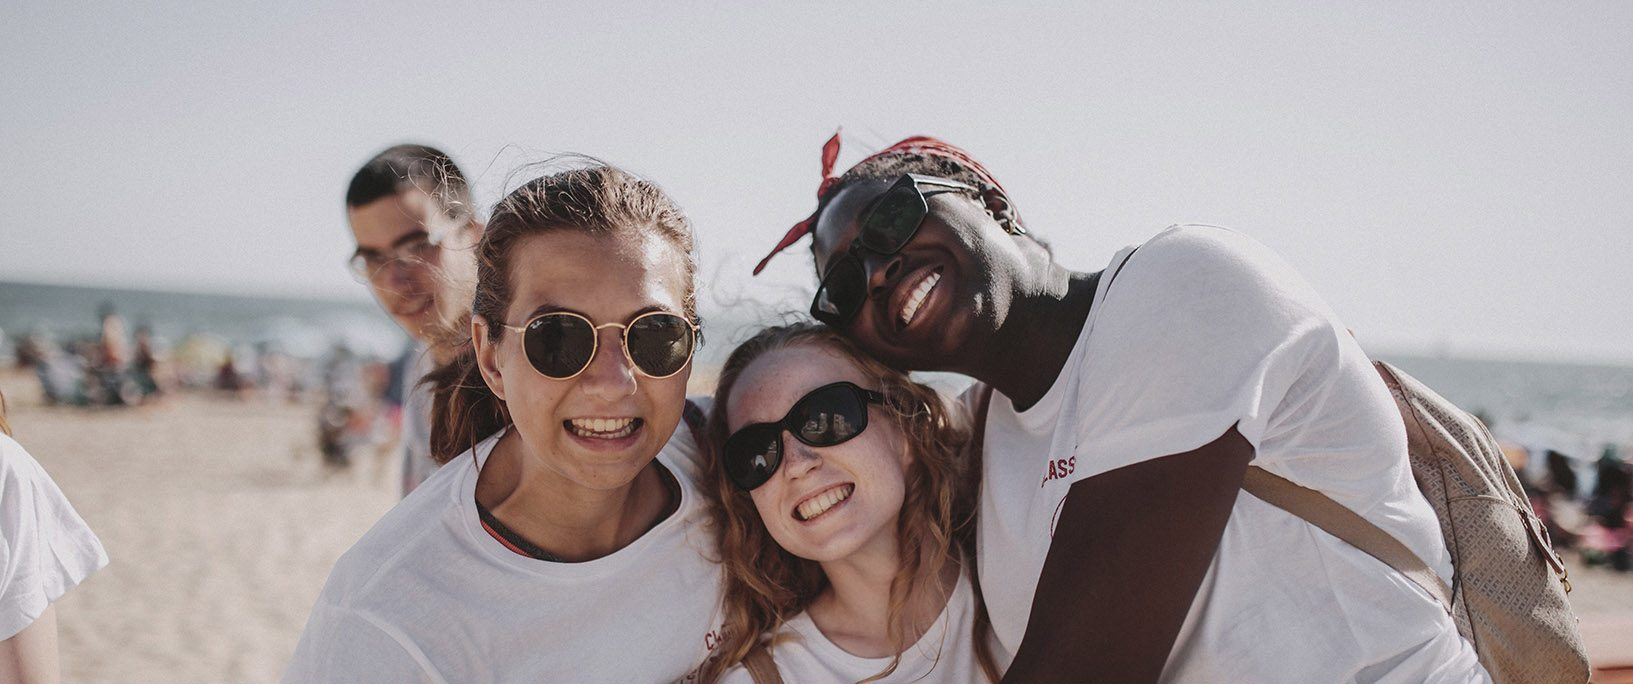 University Spanish individual study abroad summer program Cadiz Spain